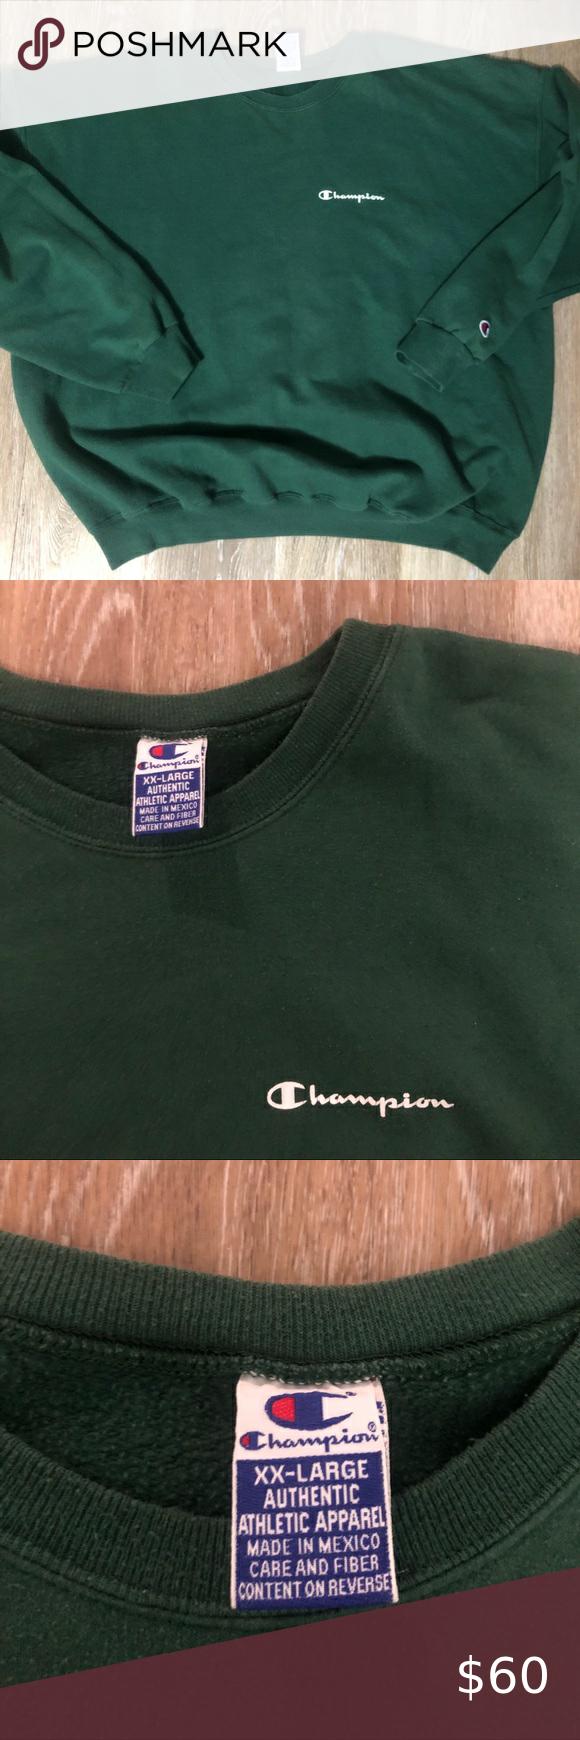 Vintage Champion Sweatshirt Champion Sweatshirt Champion Sweatshirt Vintage Sweatshirts [ 1740 x 580 Pixel ]